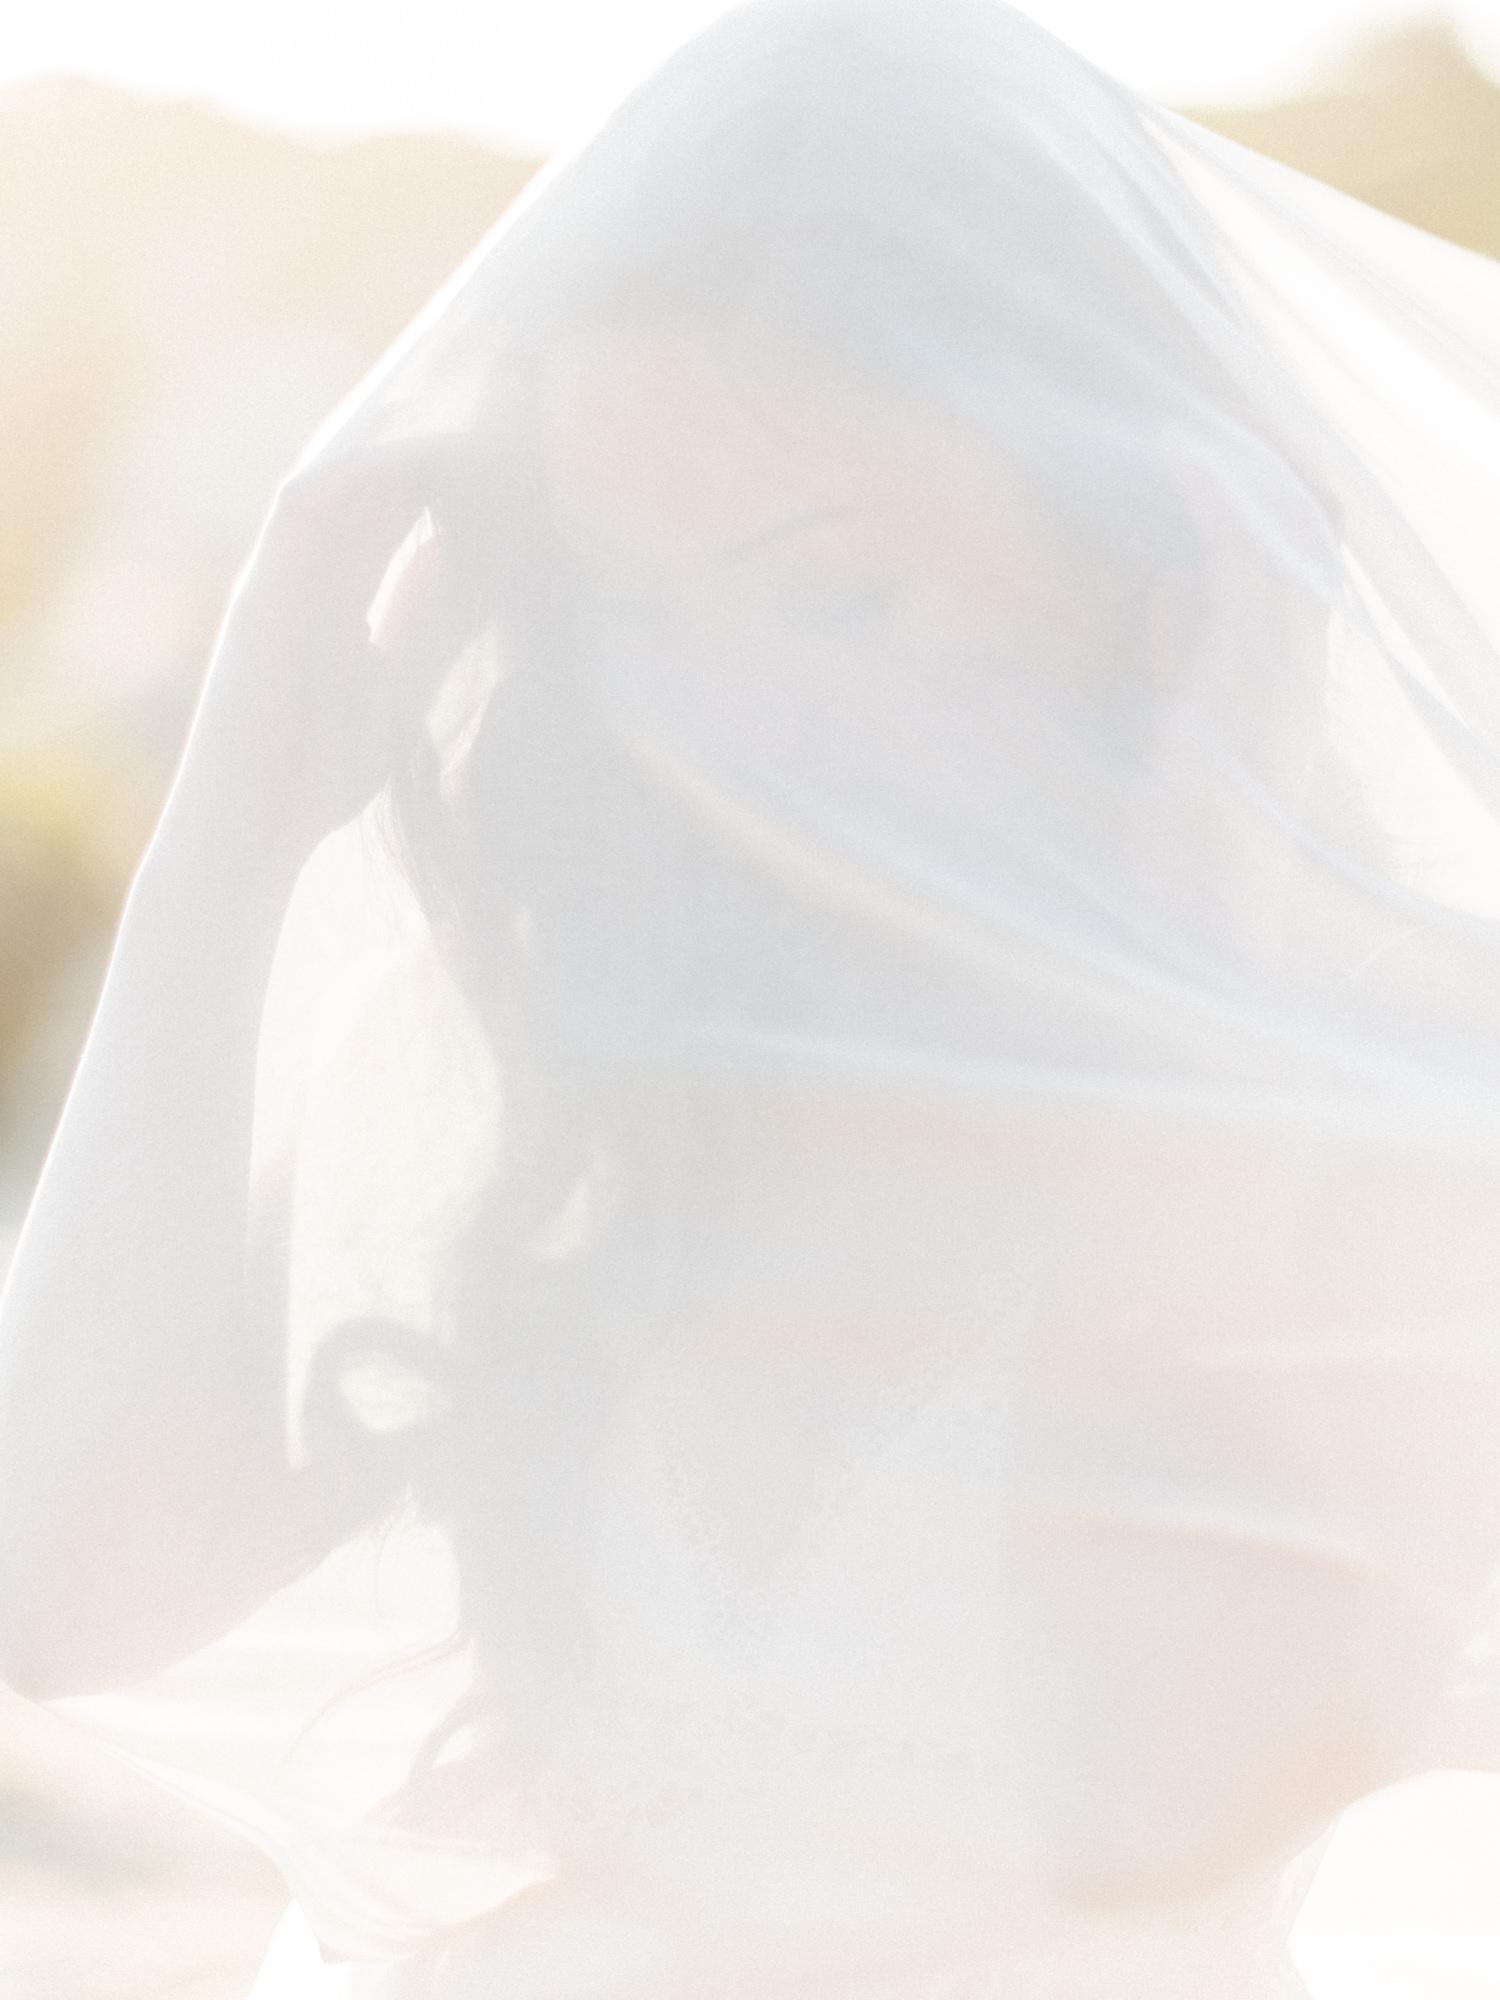 waop-marissa&sunny-engagement-0174.jpg